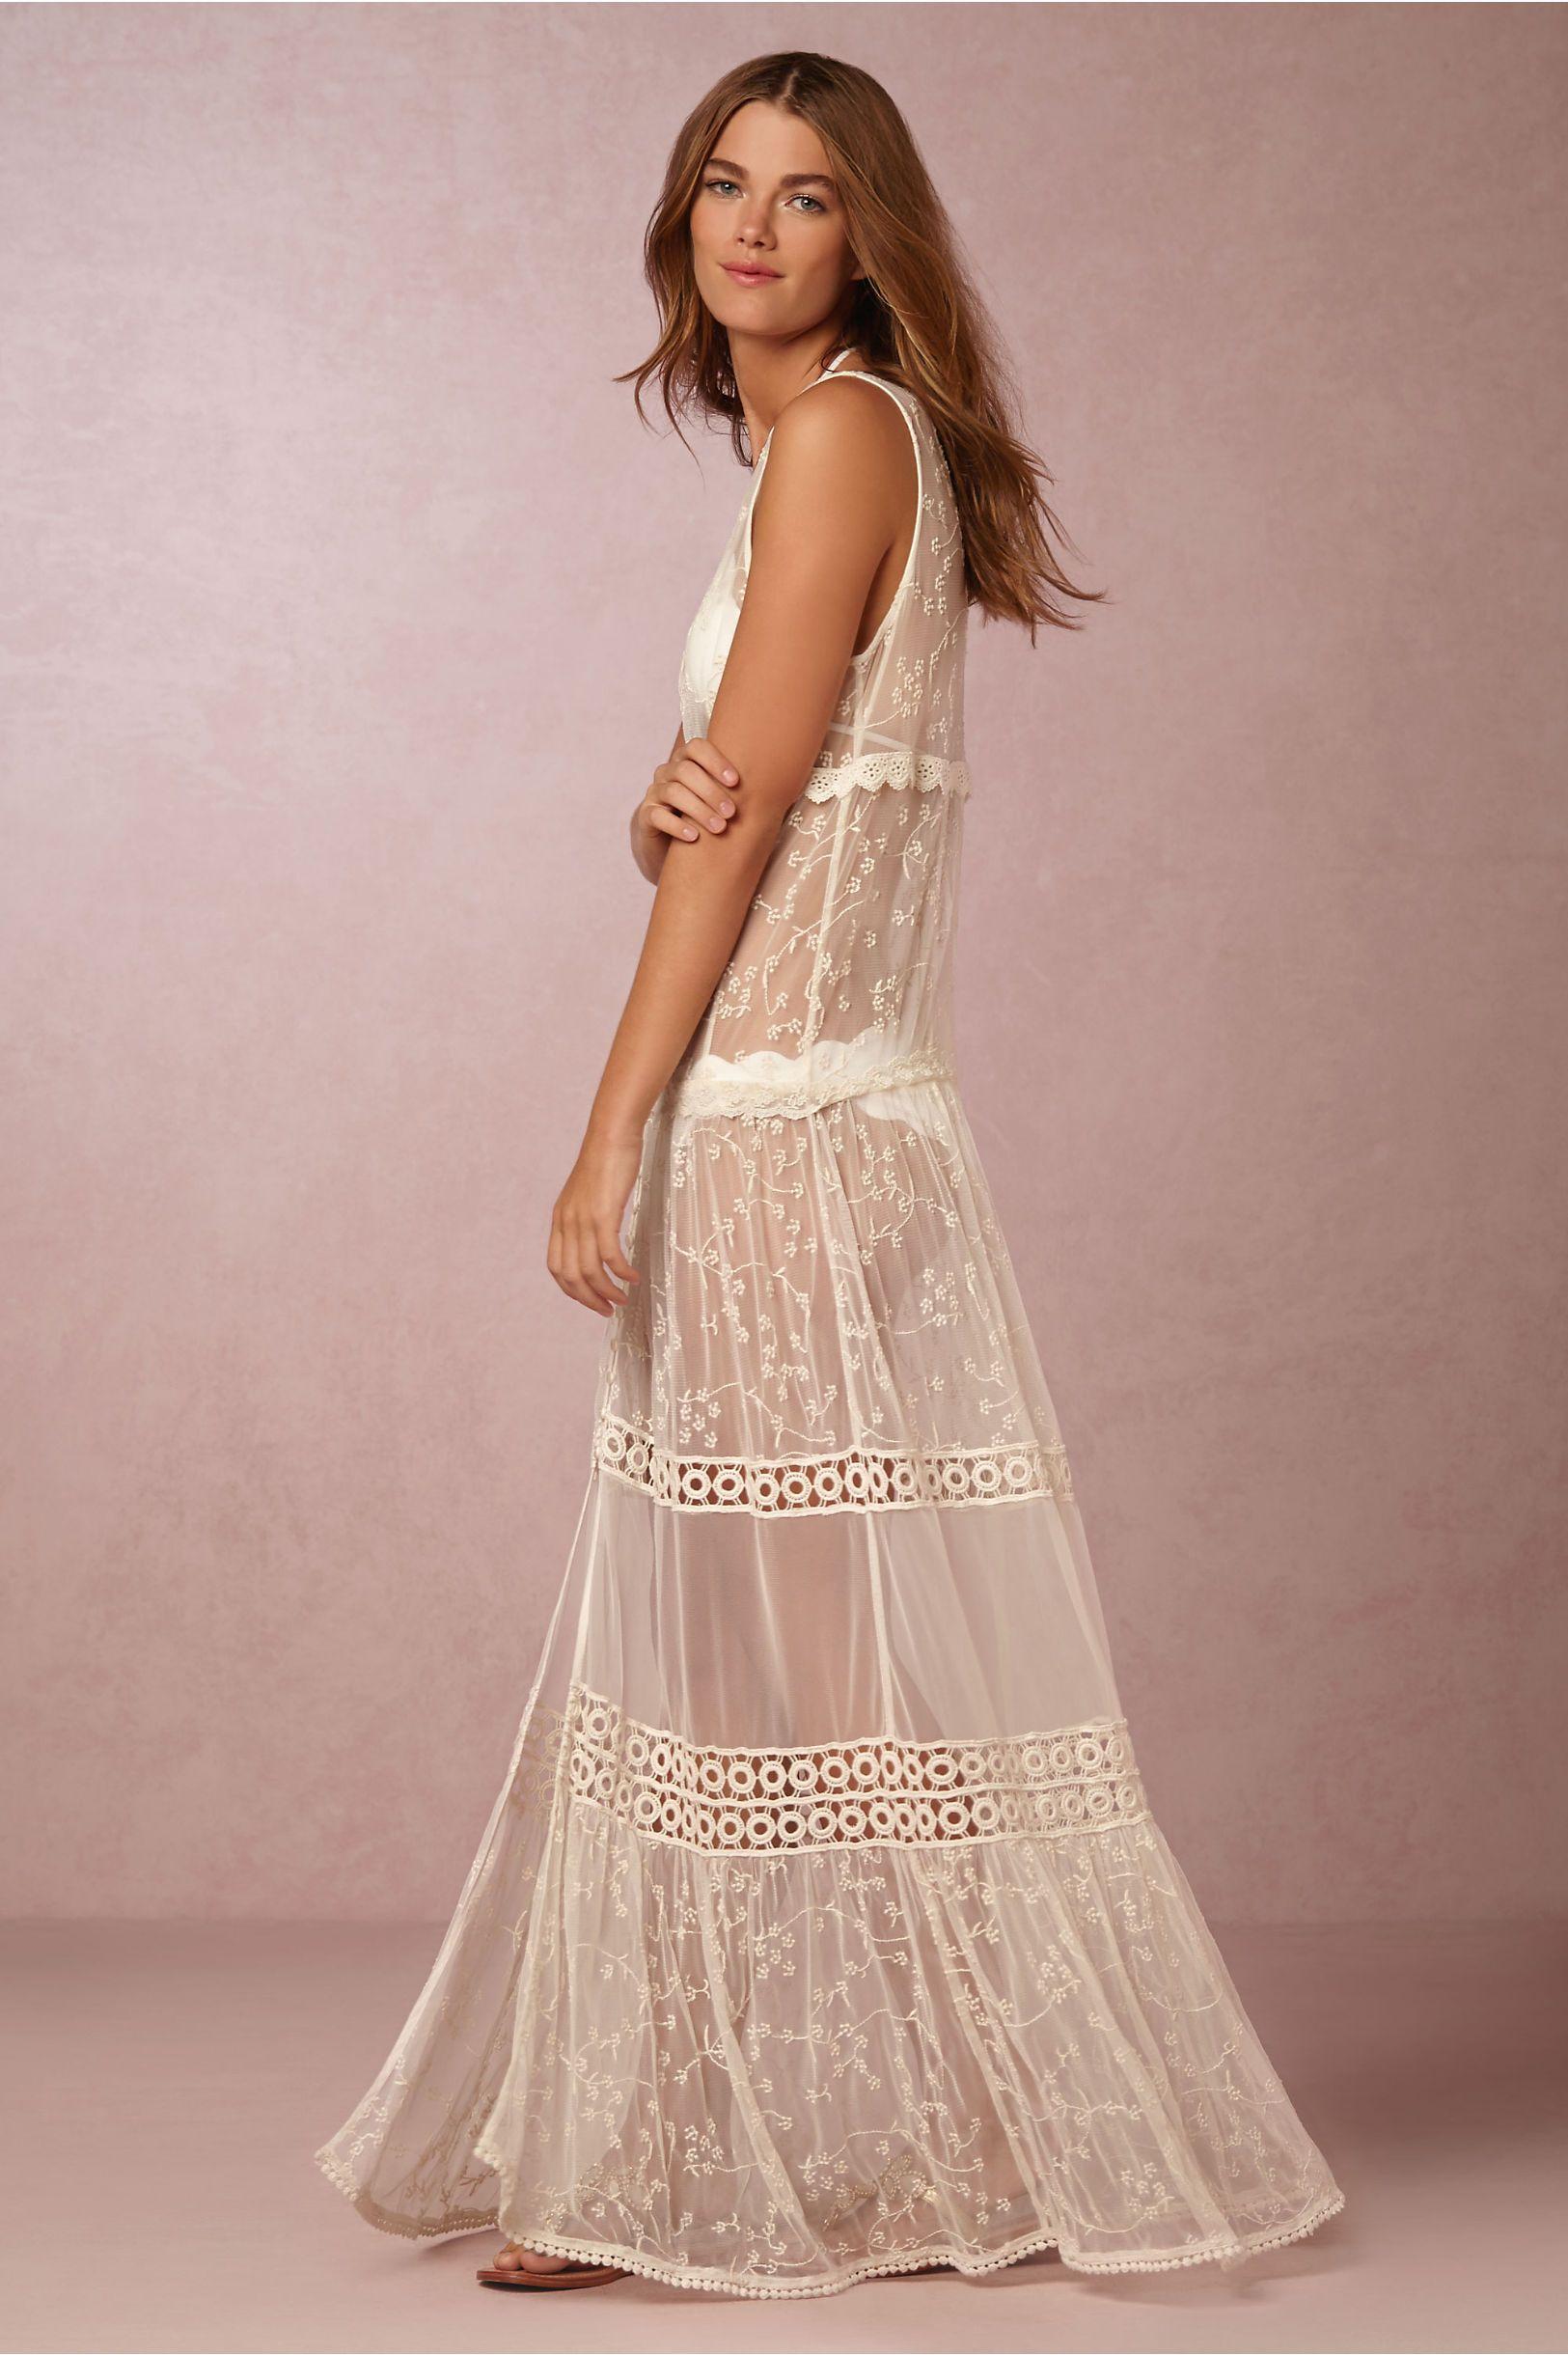 BHLDN Riona Sheer Gown in Beach & Honeymoon Cover Ups at BHLDN ...